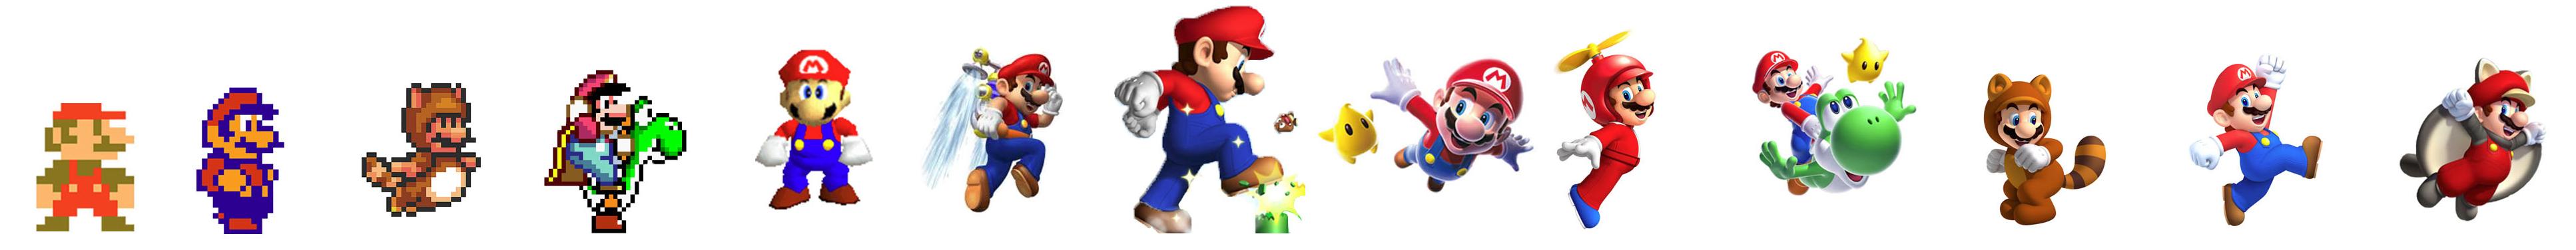 Evolution de Mario